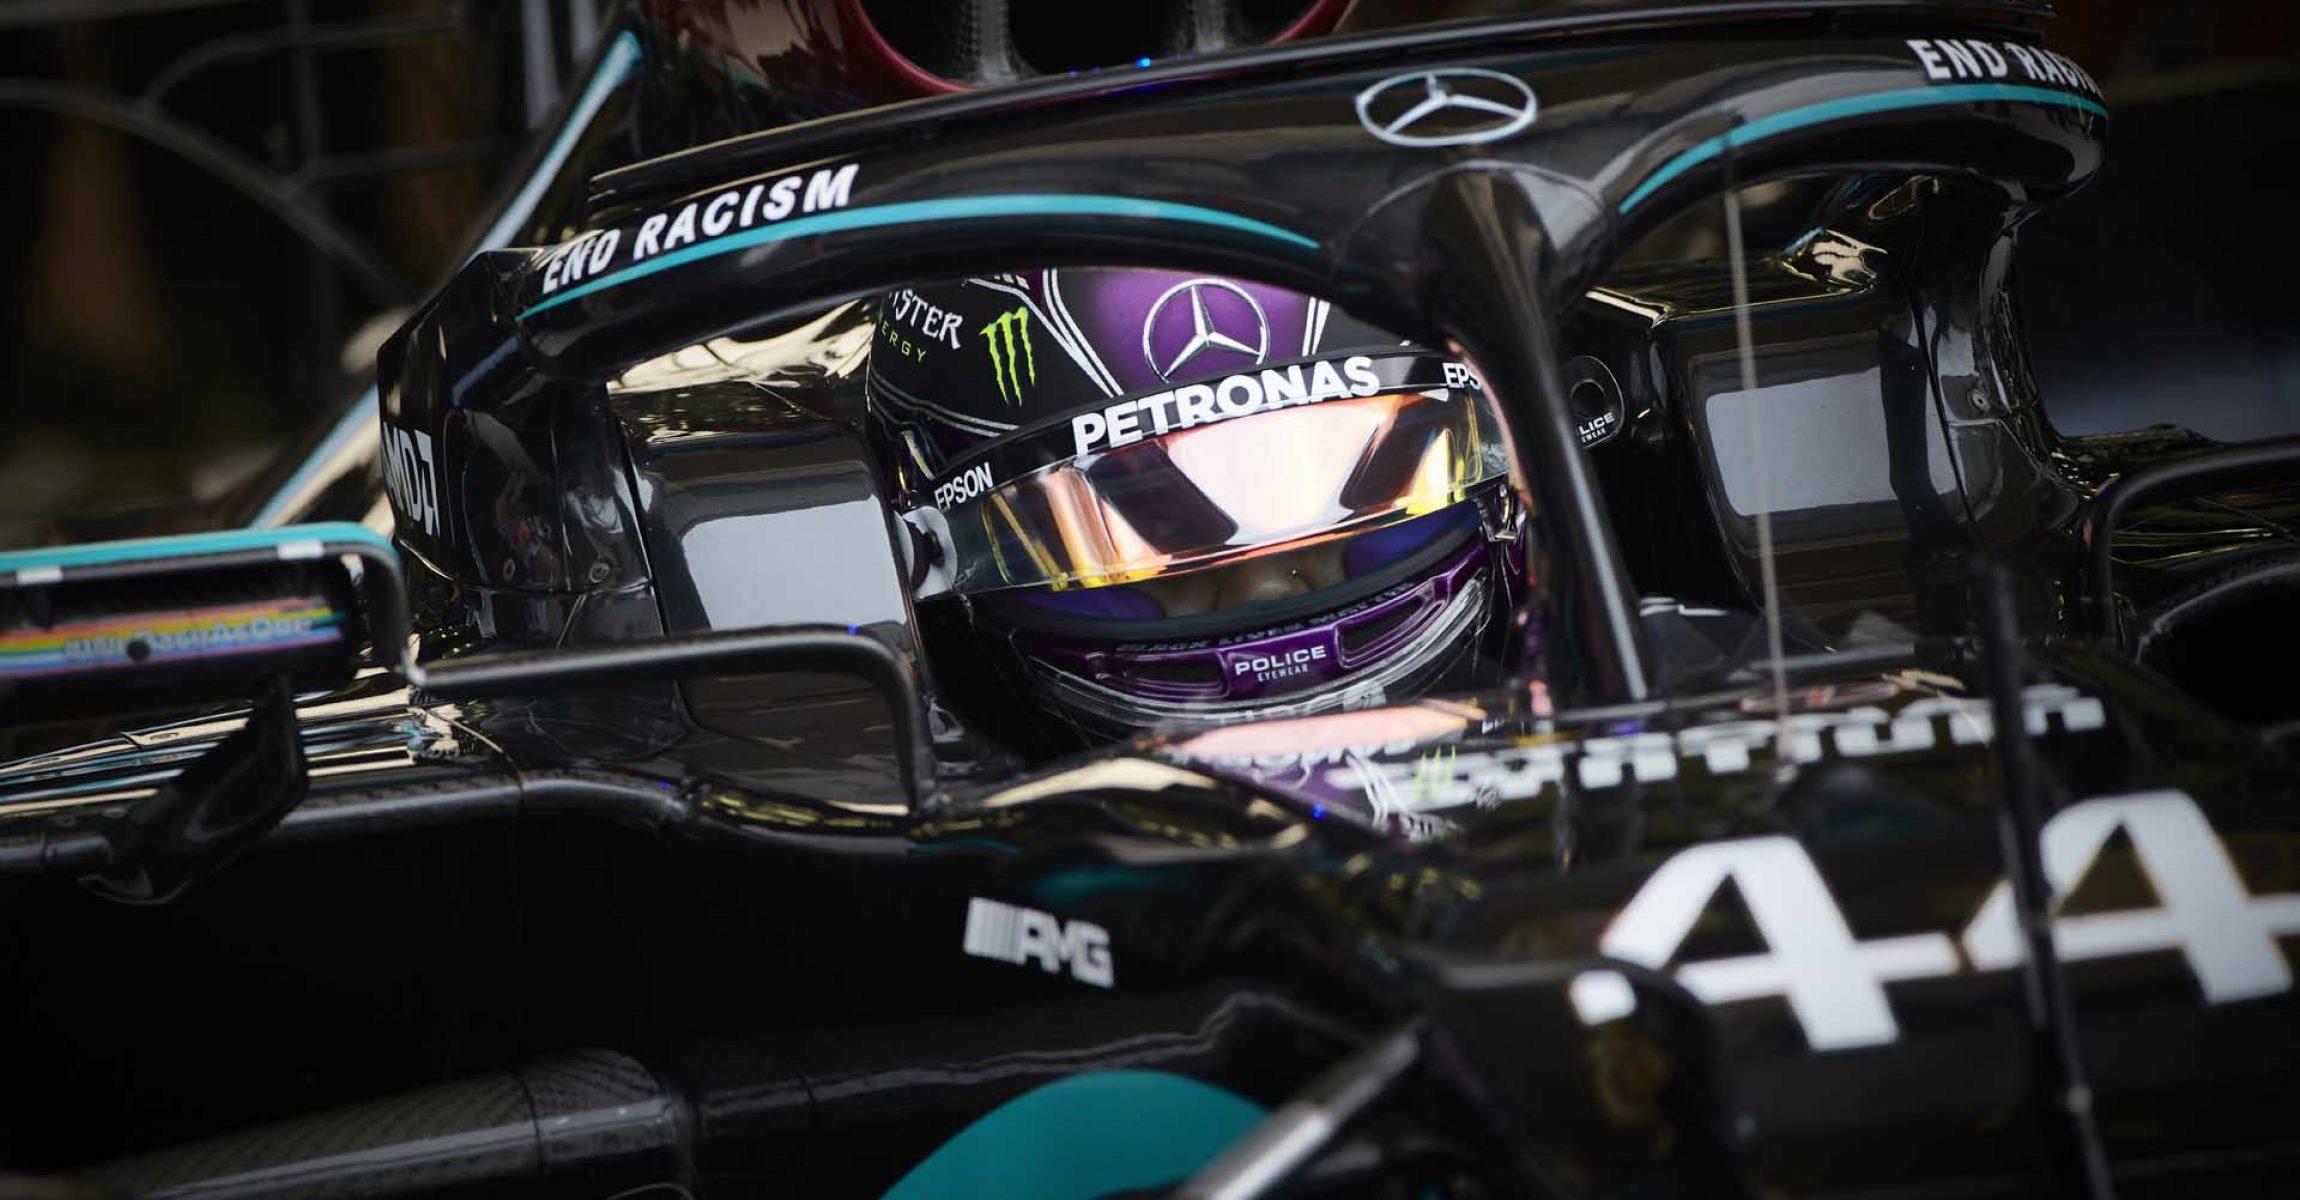 2020 Bahrain Grand Prix, Saturday - Steve Etherington Lewis Hamilton Mercedes